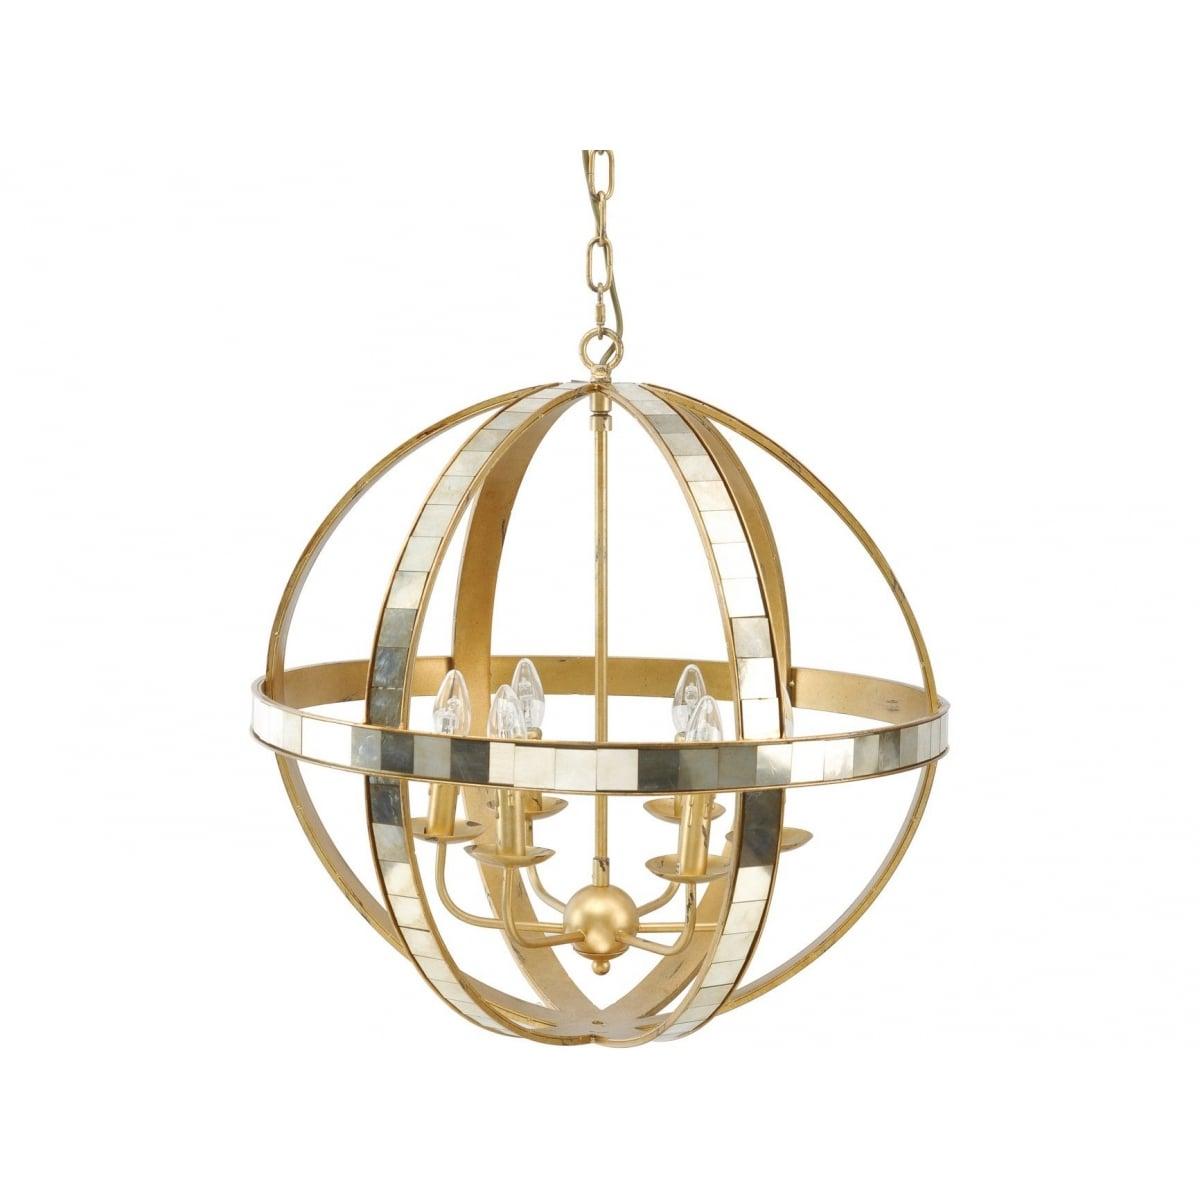 Gold Orb Chandelier   Modern Ceiling Light   Swanky Interiors